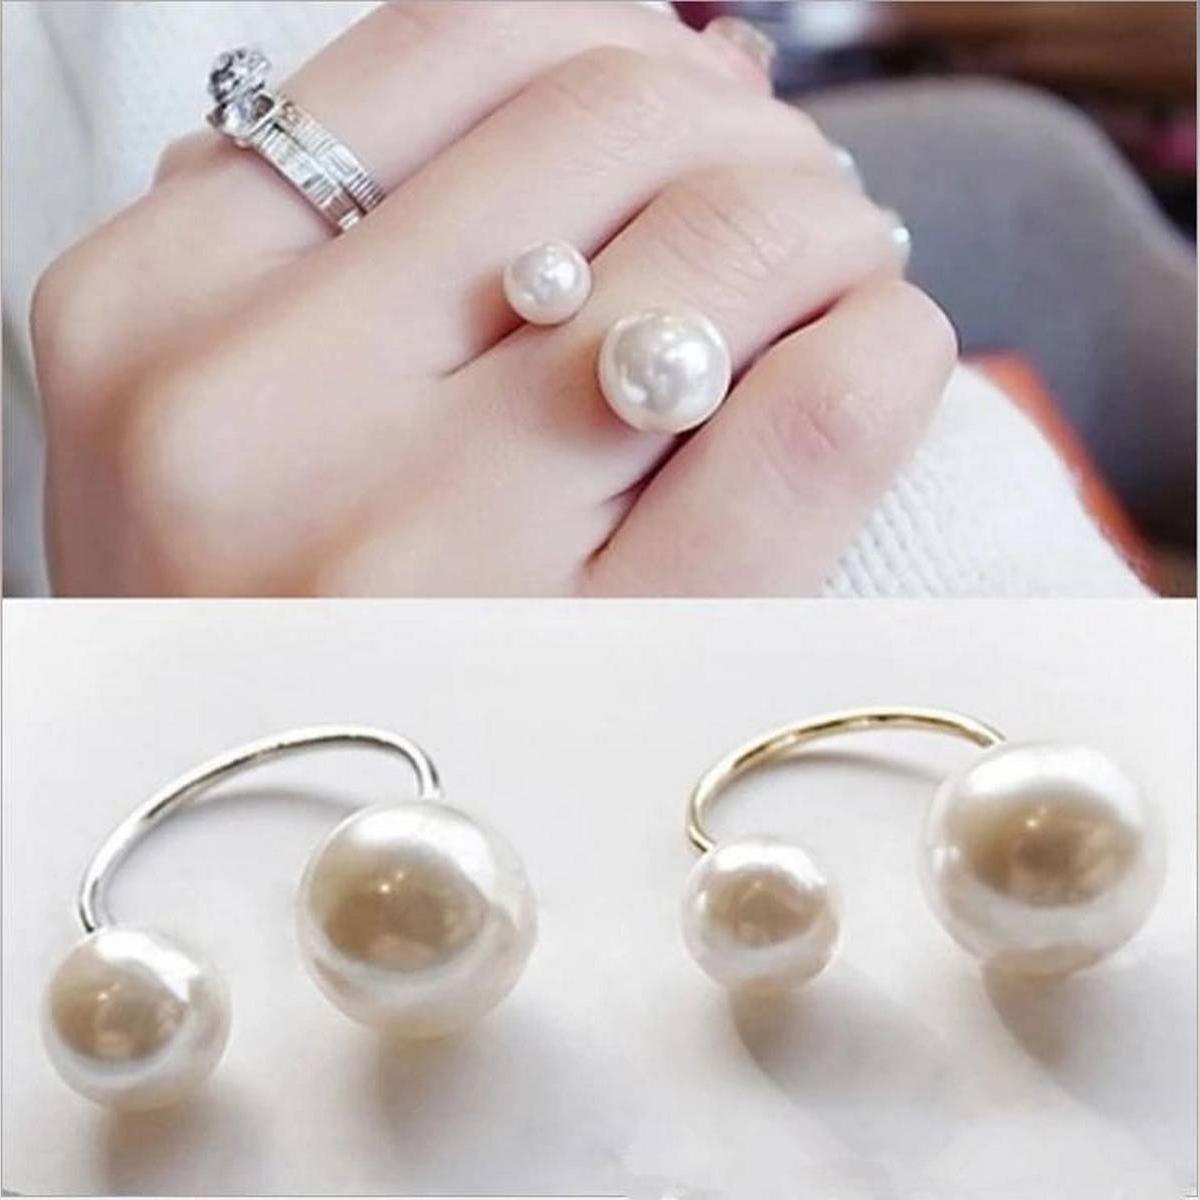 Silver Pearls Girls Ring Trendy Fashion Jewellery Women Rings